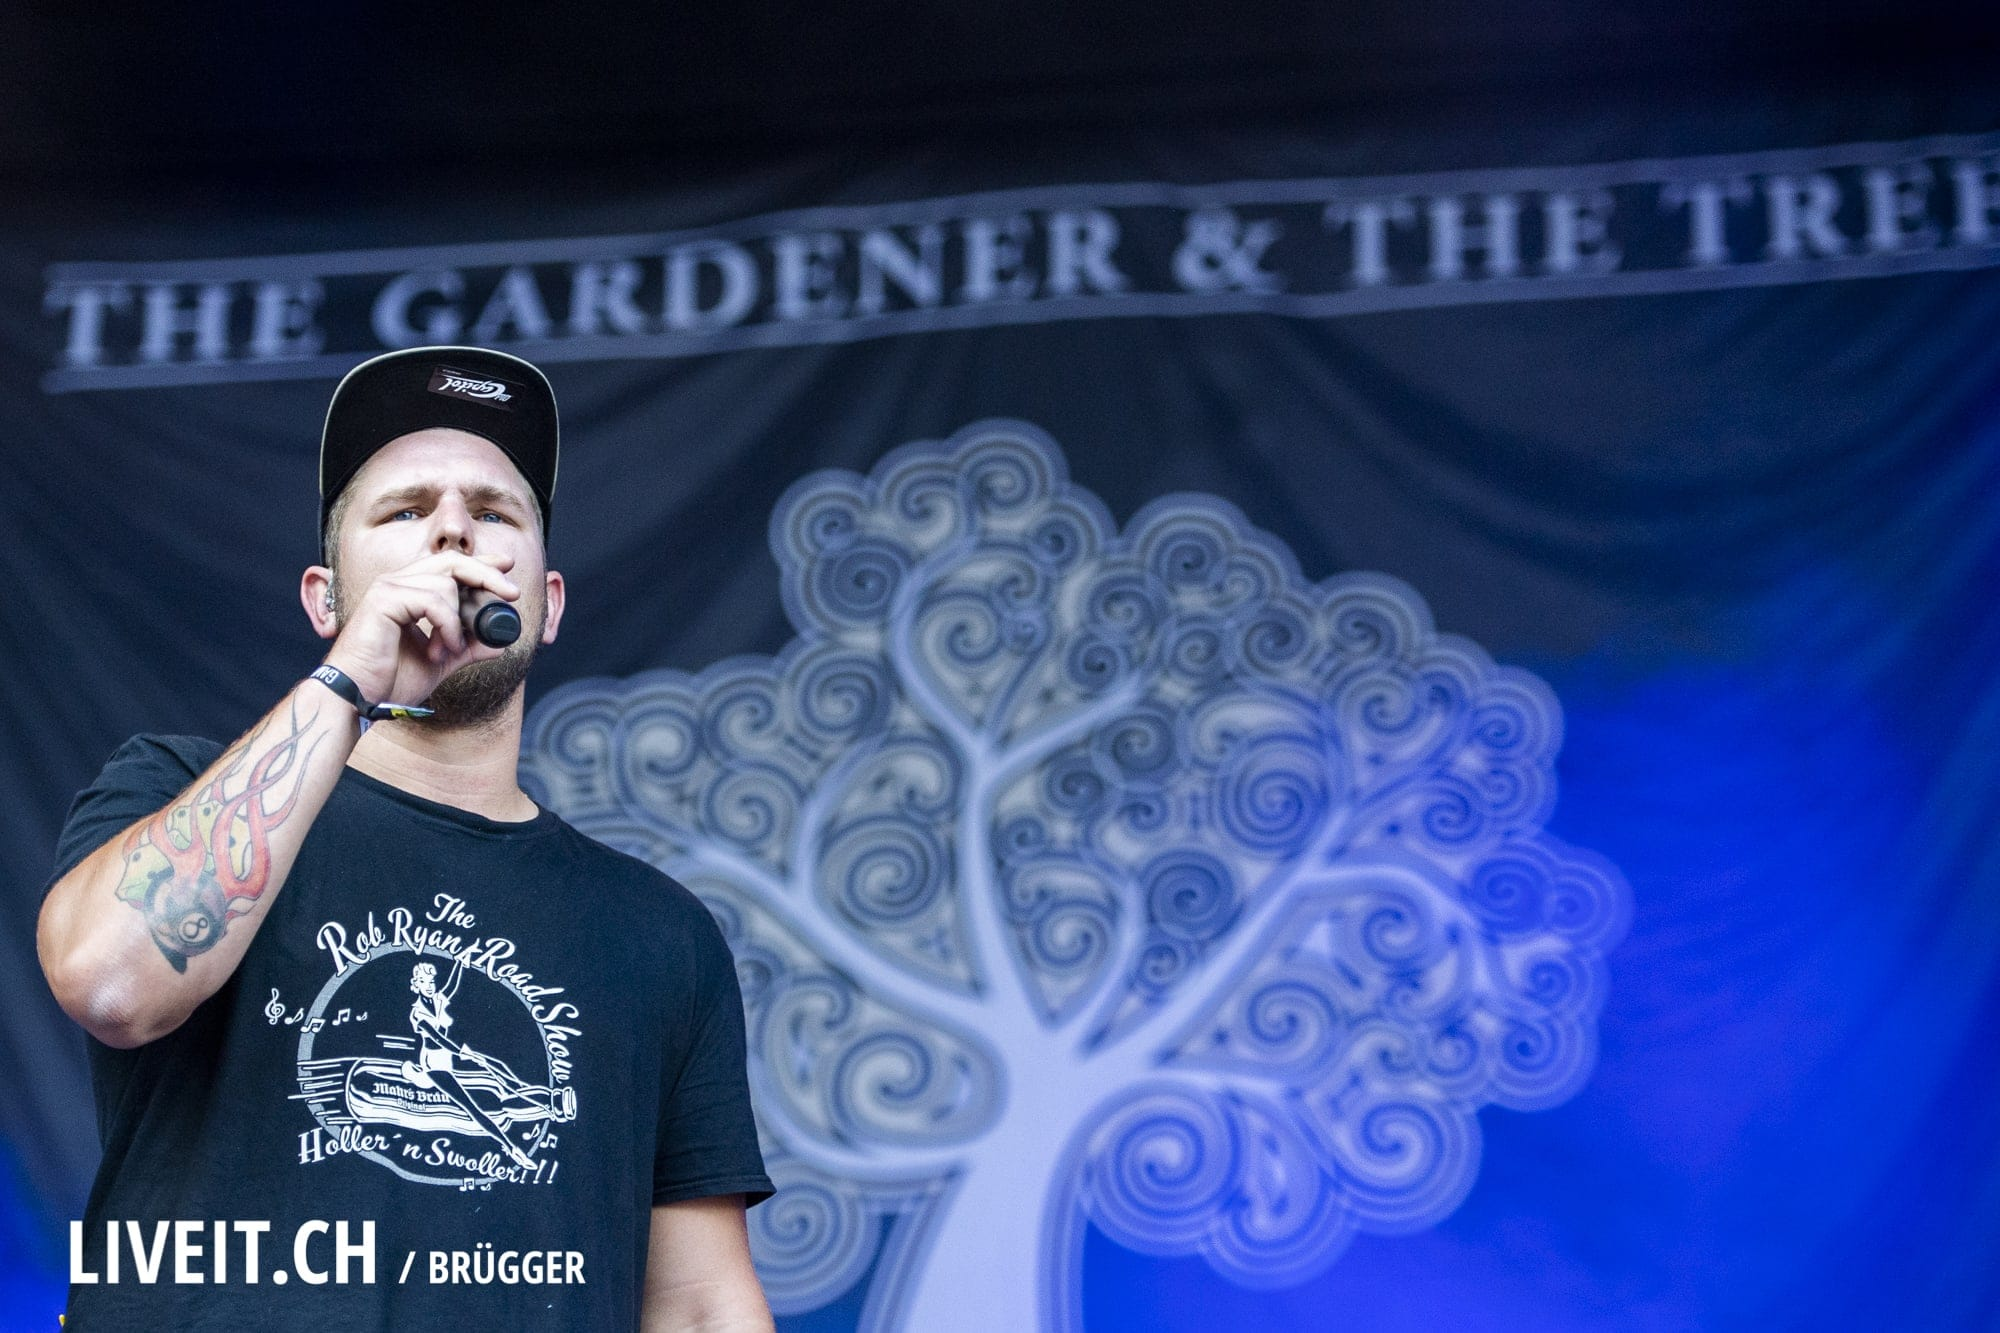 The Gardener and The Tree fotografiert am Openair Gampel 2018. (Dominic Bruegger for liveit.ch)